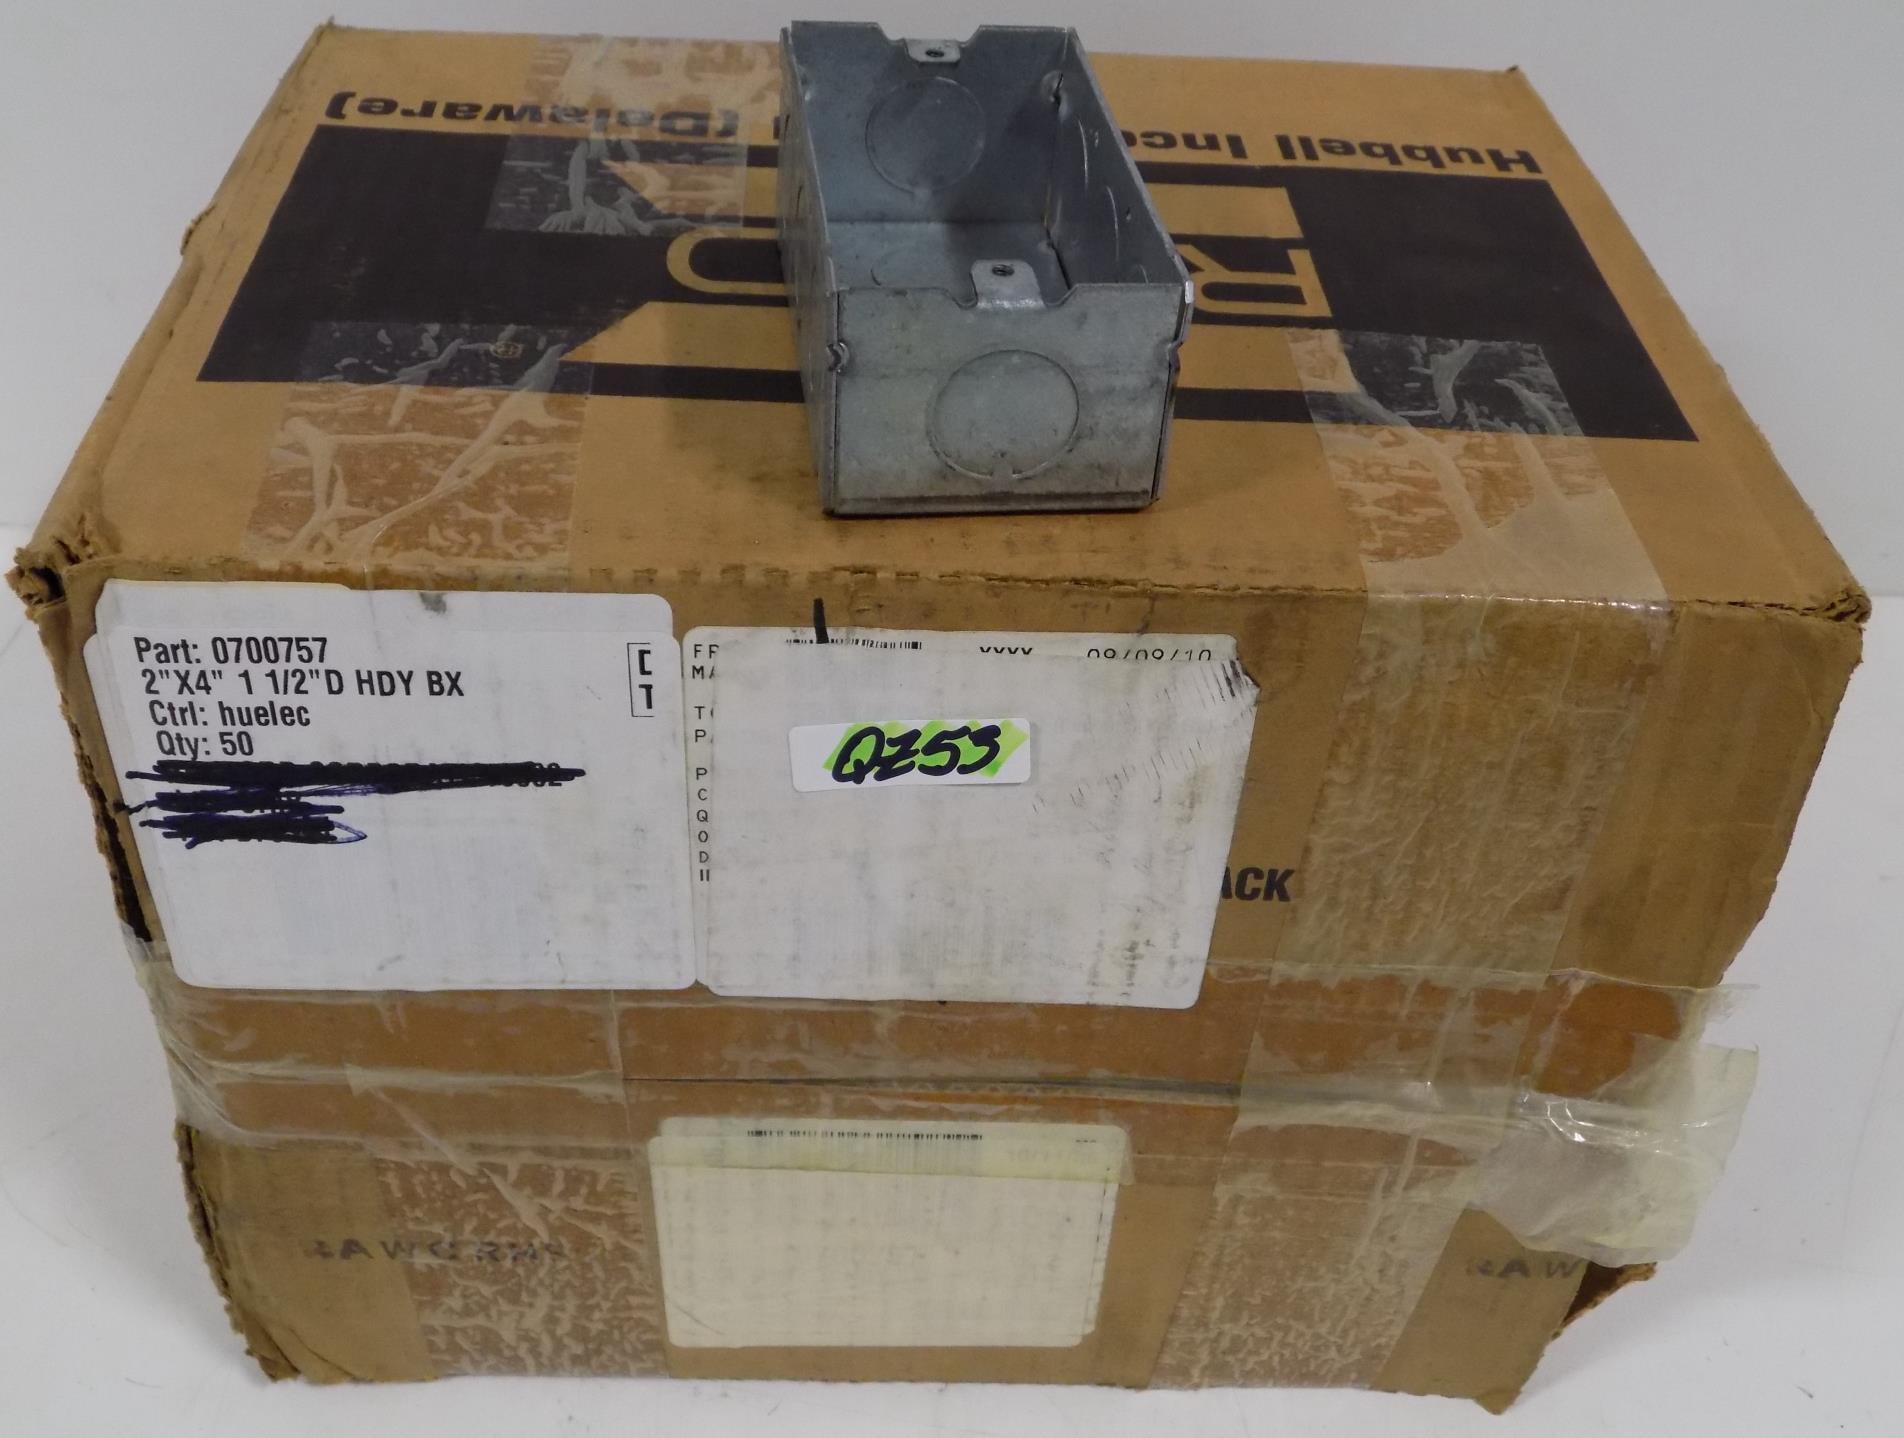 Hubbell 5324-0 Outlet Box 18.3 Cu-In 1 Gang 4-1//2 In L X 2-3//4 In W X 2 In D 4-1//2 L x 2-3//4 W x product specific